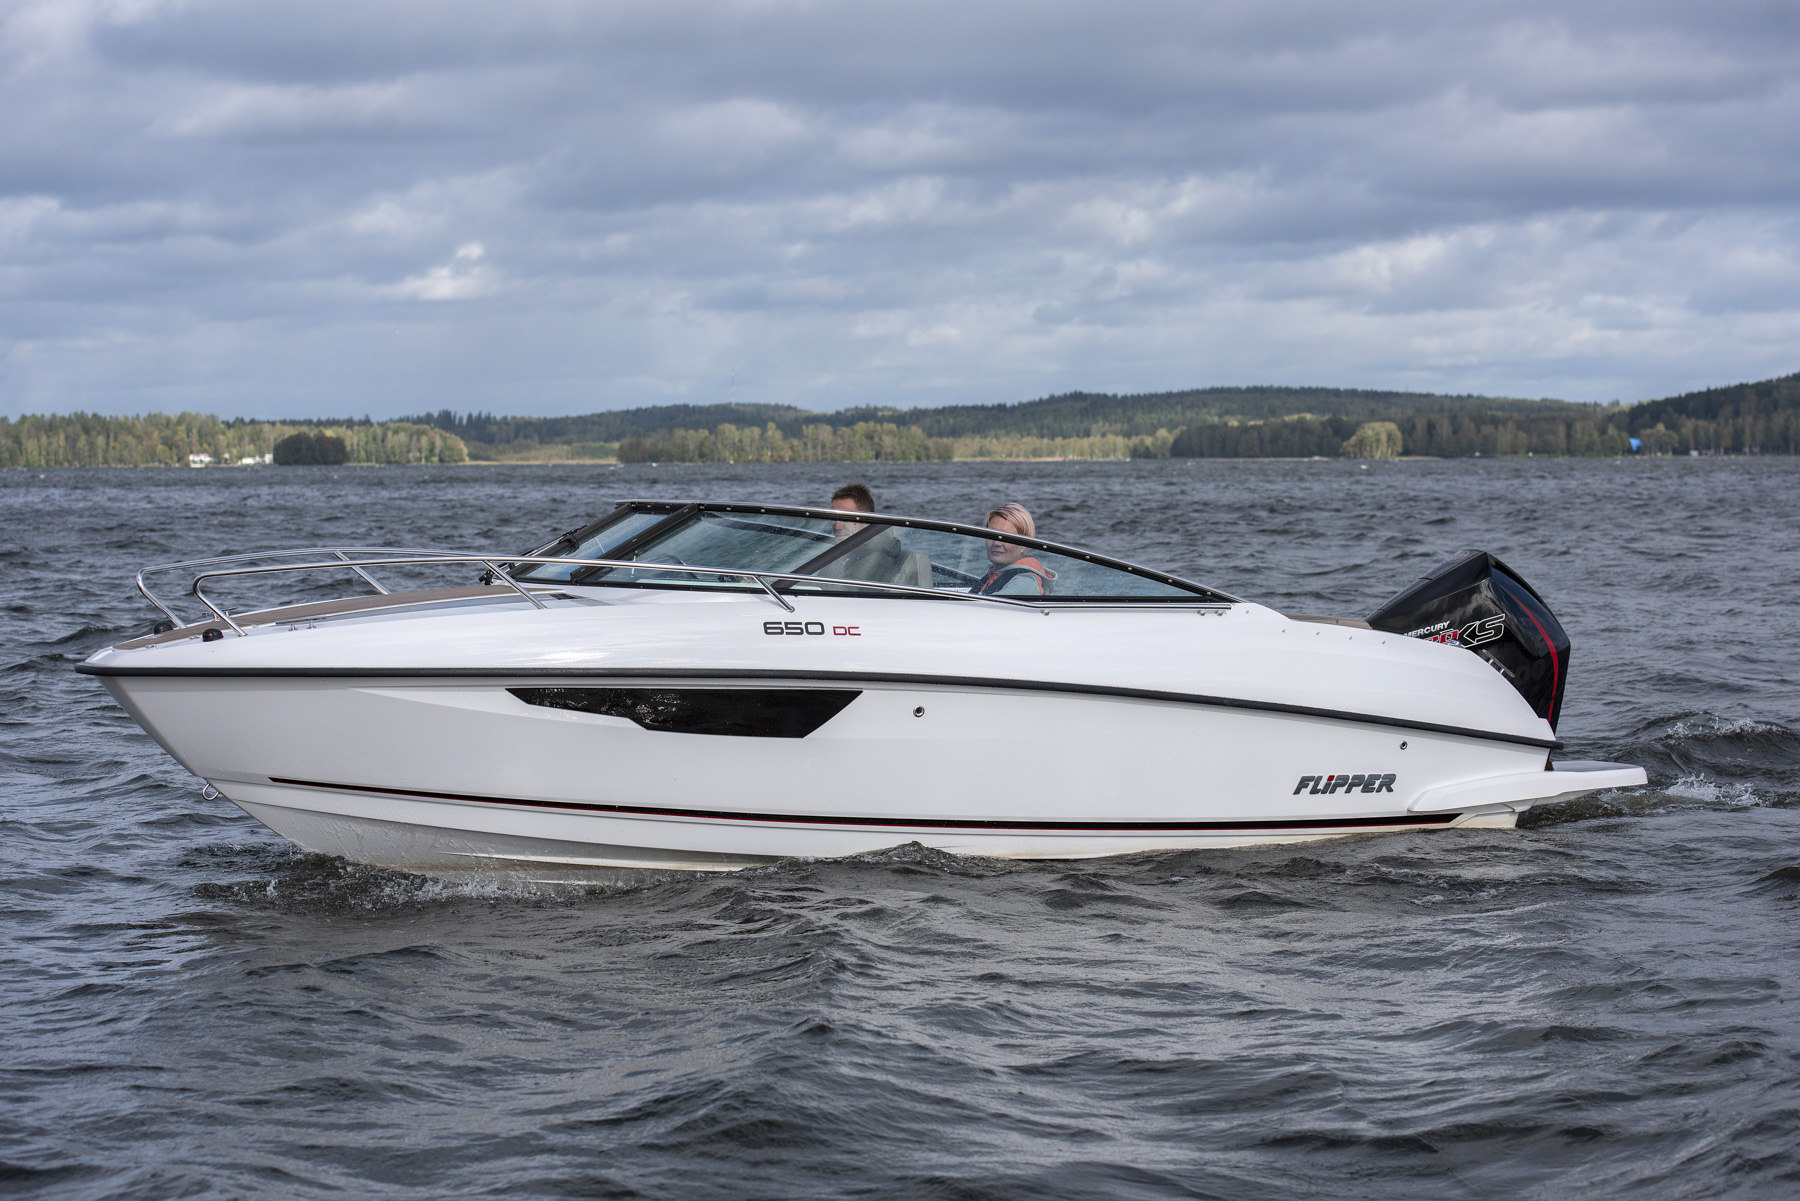 Flipper 650 Day Cruiser side profile